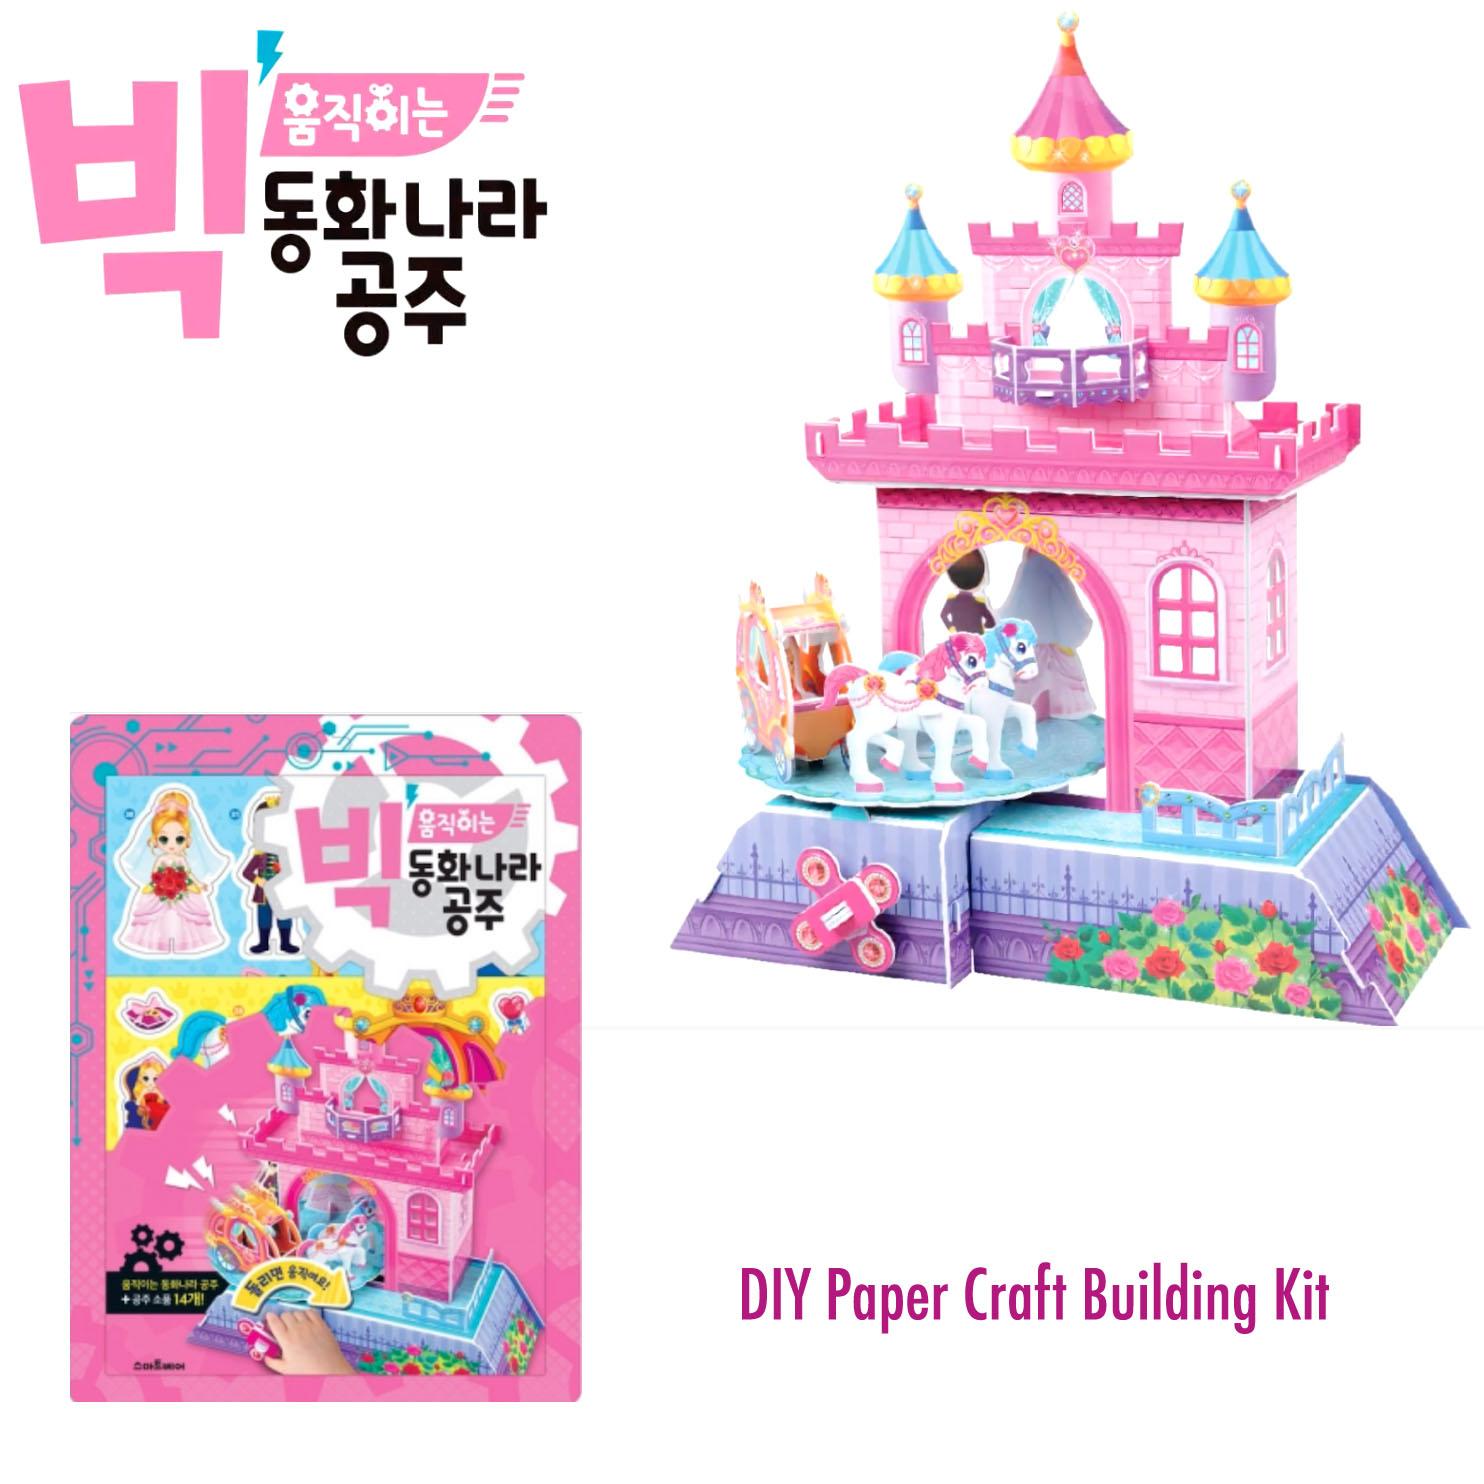 DIY PAPER CRAFT BUILDING KIT – Princess Castle